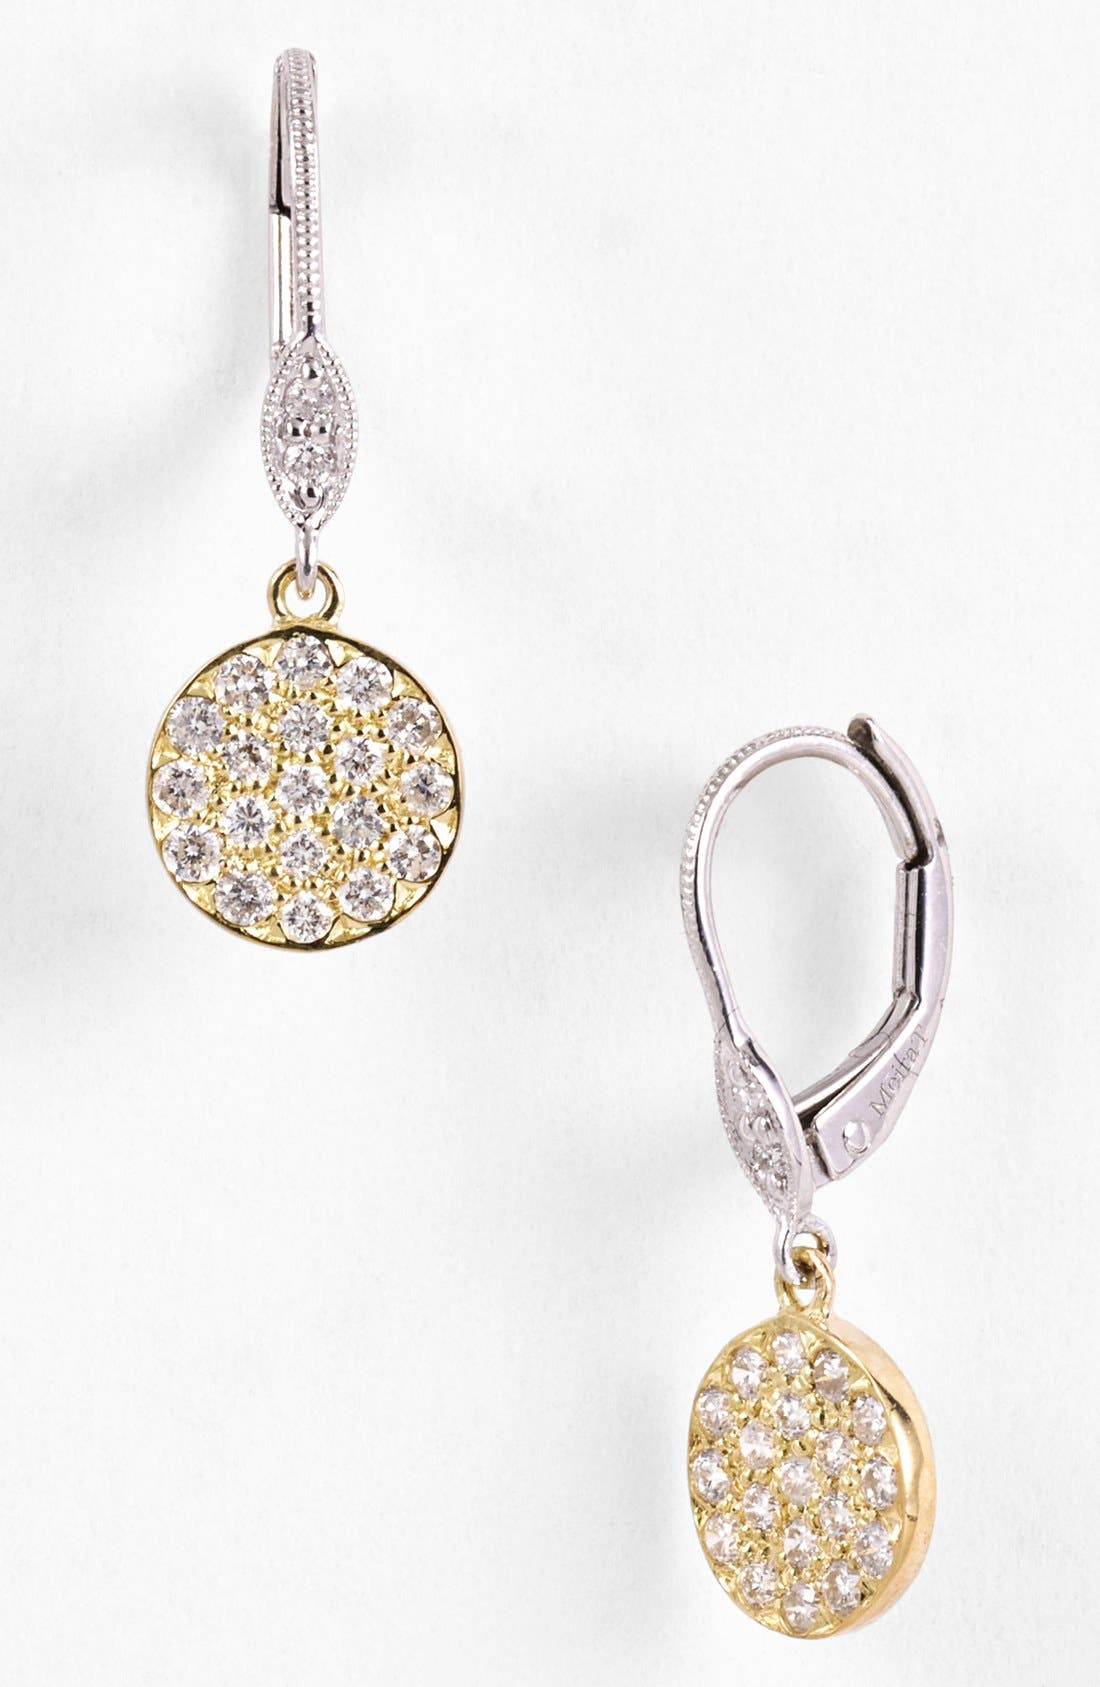 MeiraT 'Dazzling' Diamond Disc Drop Earrings,                         Main,                         color, Yellow Gold